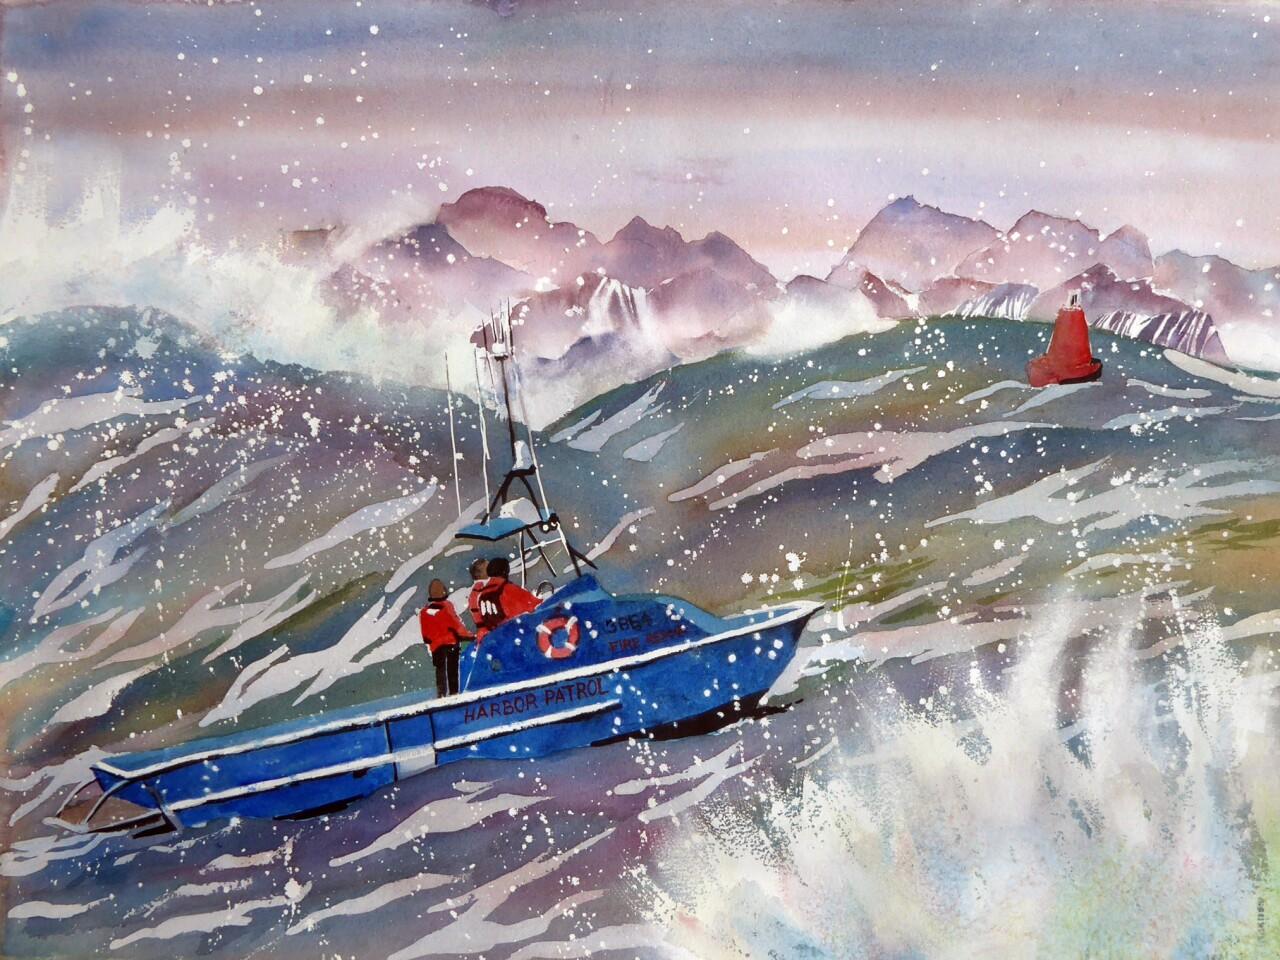 Harbor Storm by Ardella Swanberg